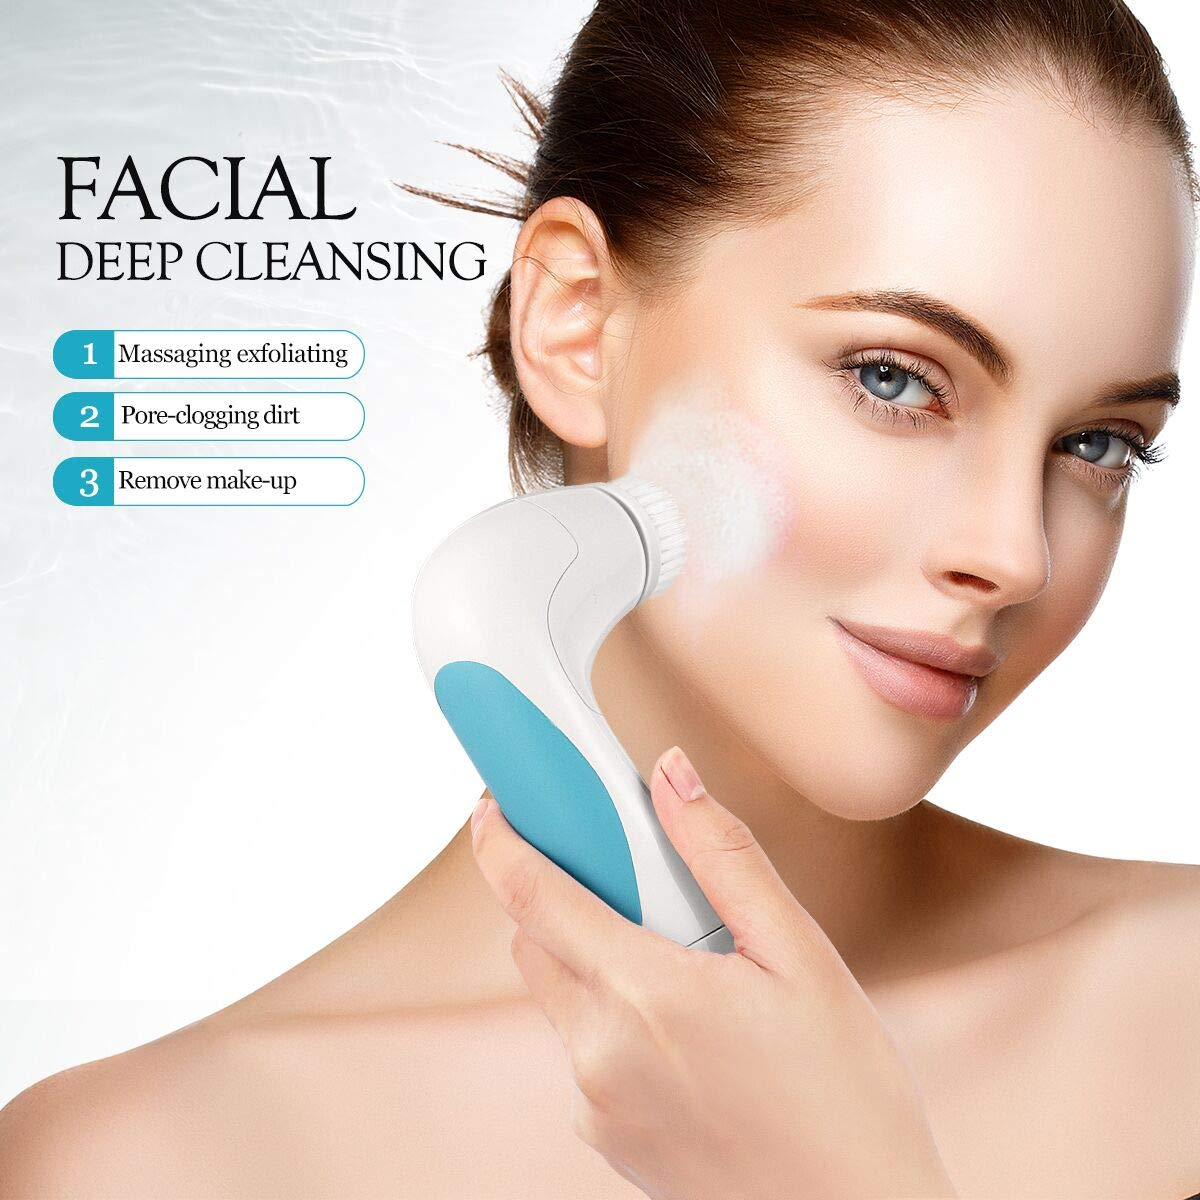 5 in 1 Facial Care Massager Facial Brush Waterproof Body Facial Cleansing Brush Spin Brush (Blue)